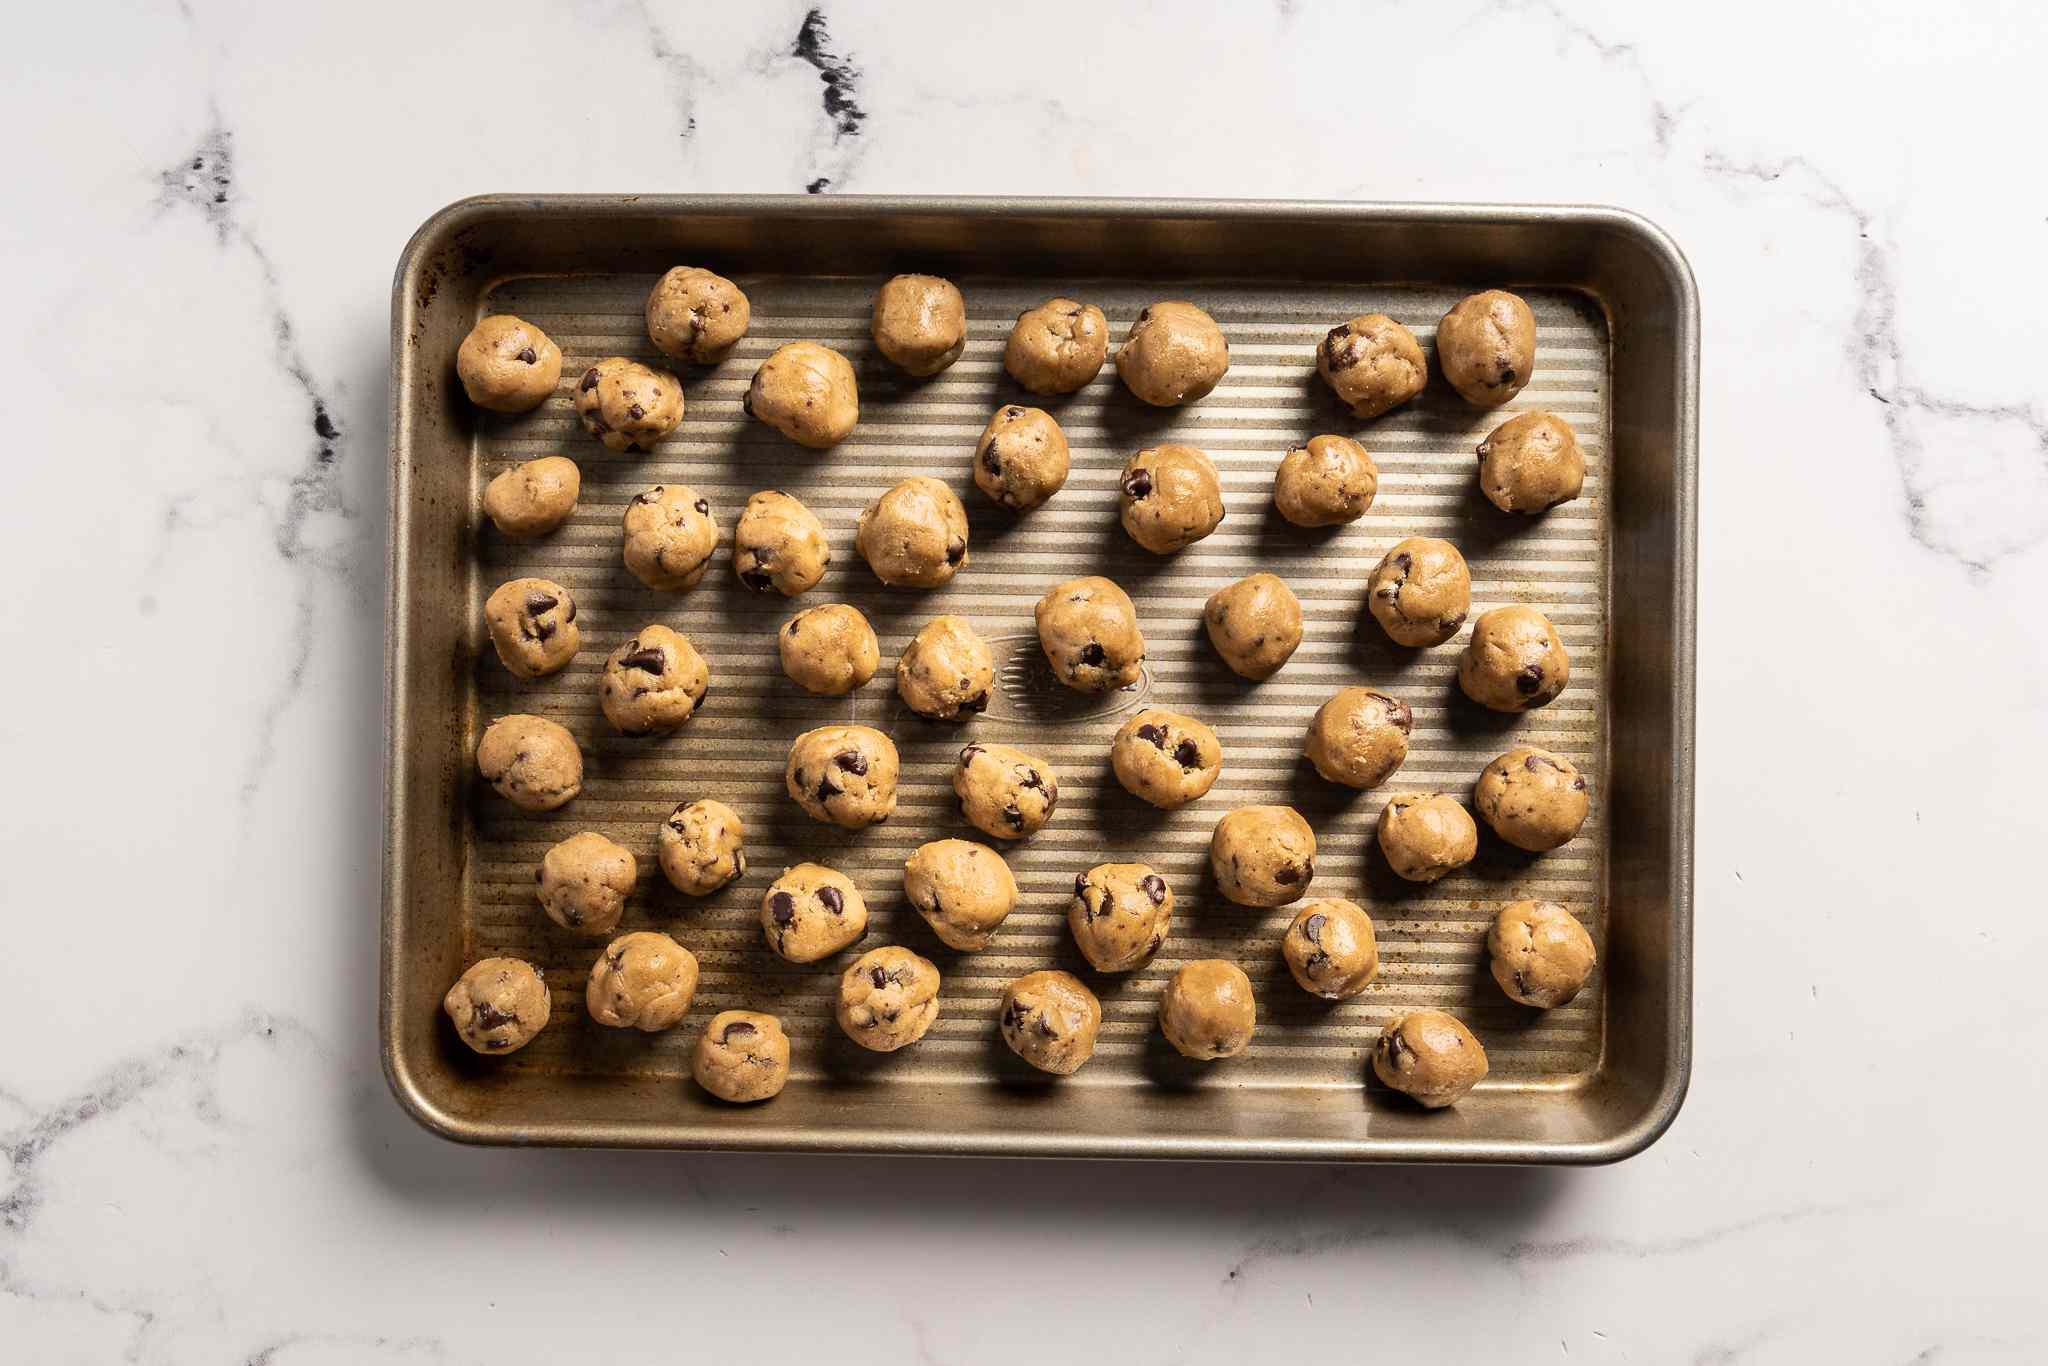 Pan with cookie dough balls